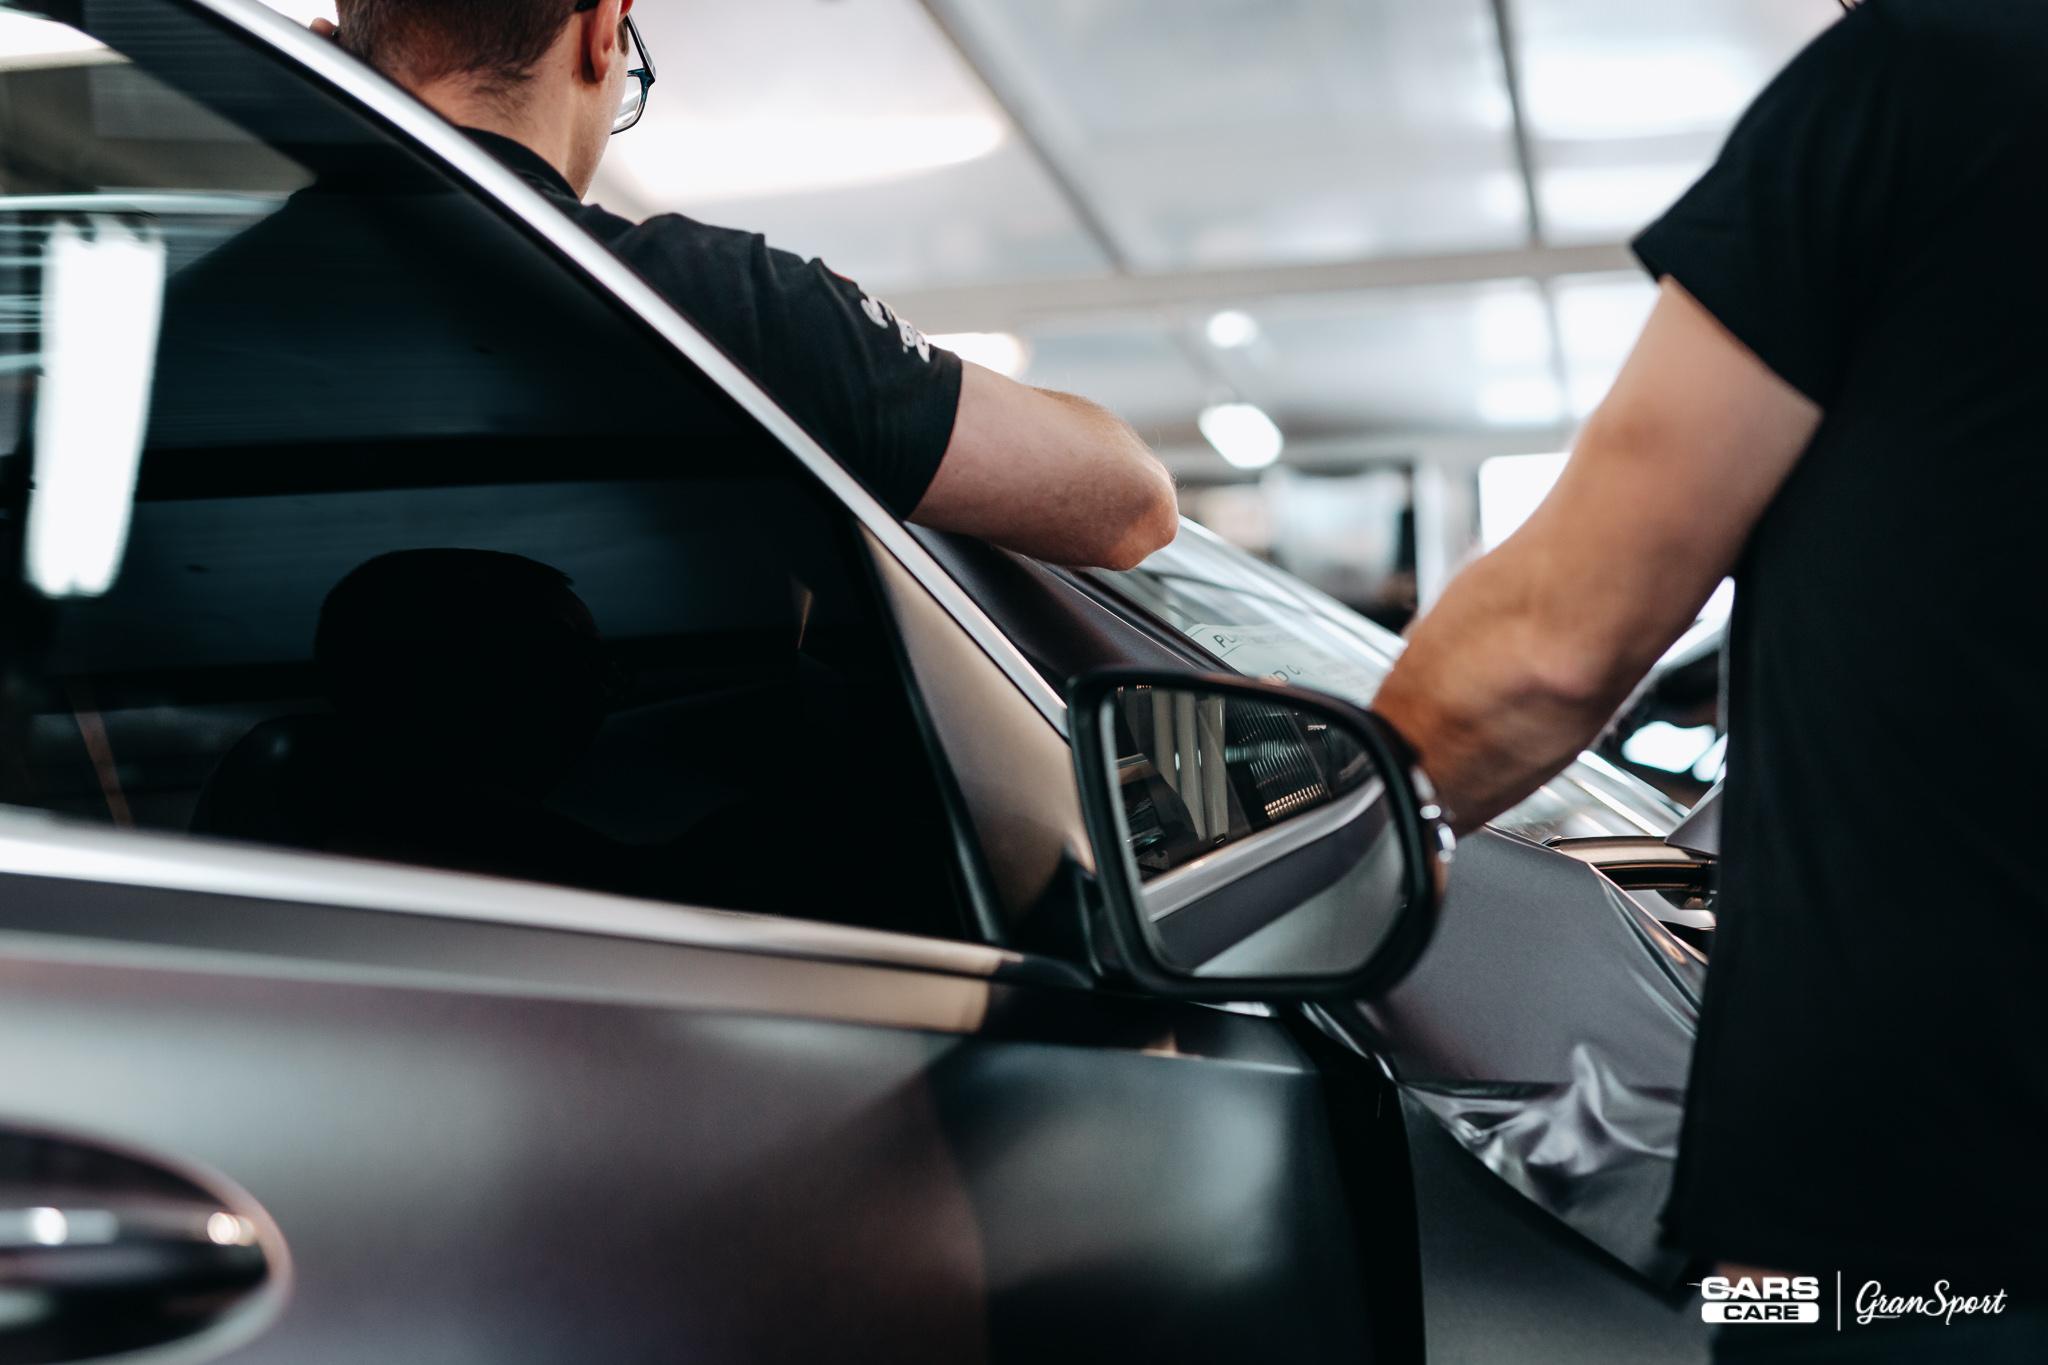 Mercedes GLS Maxhaust